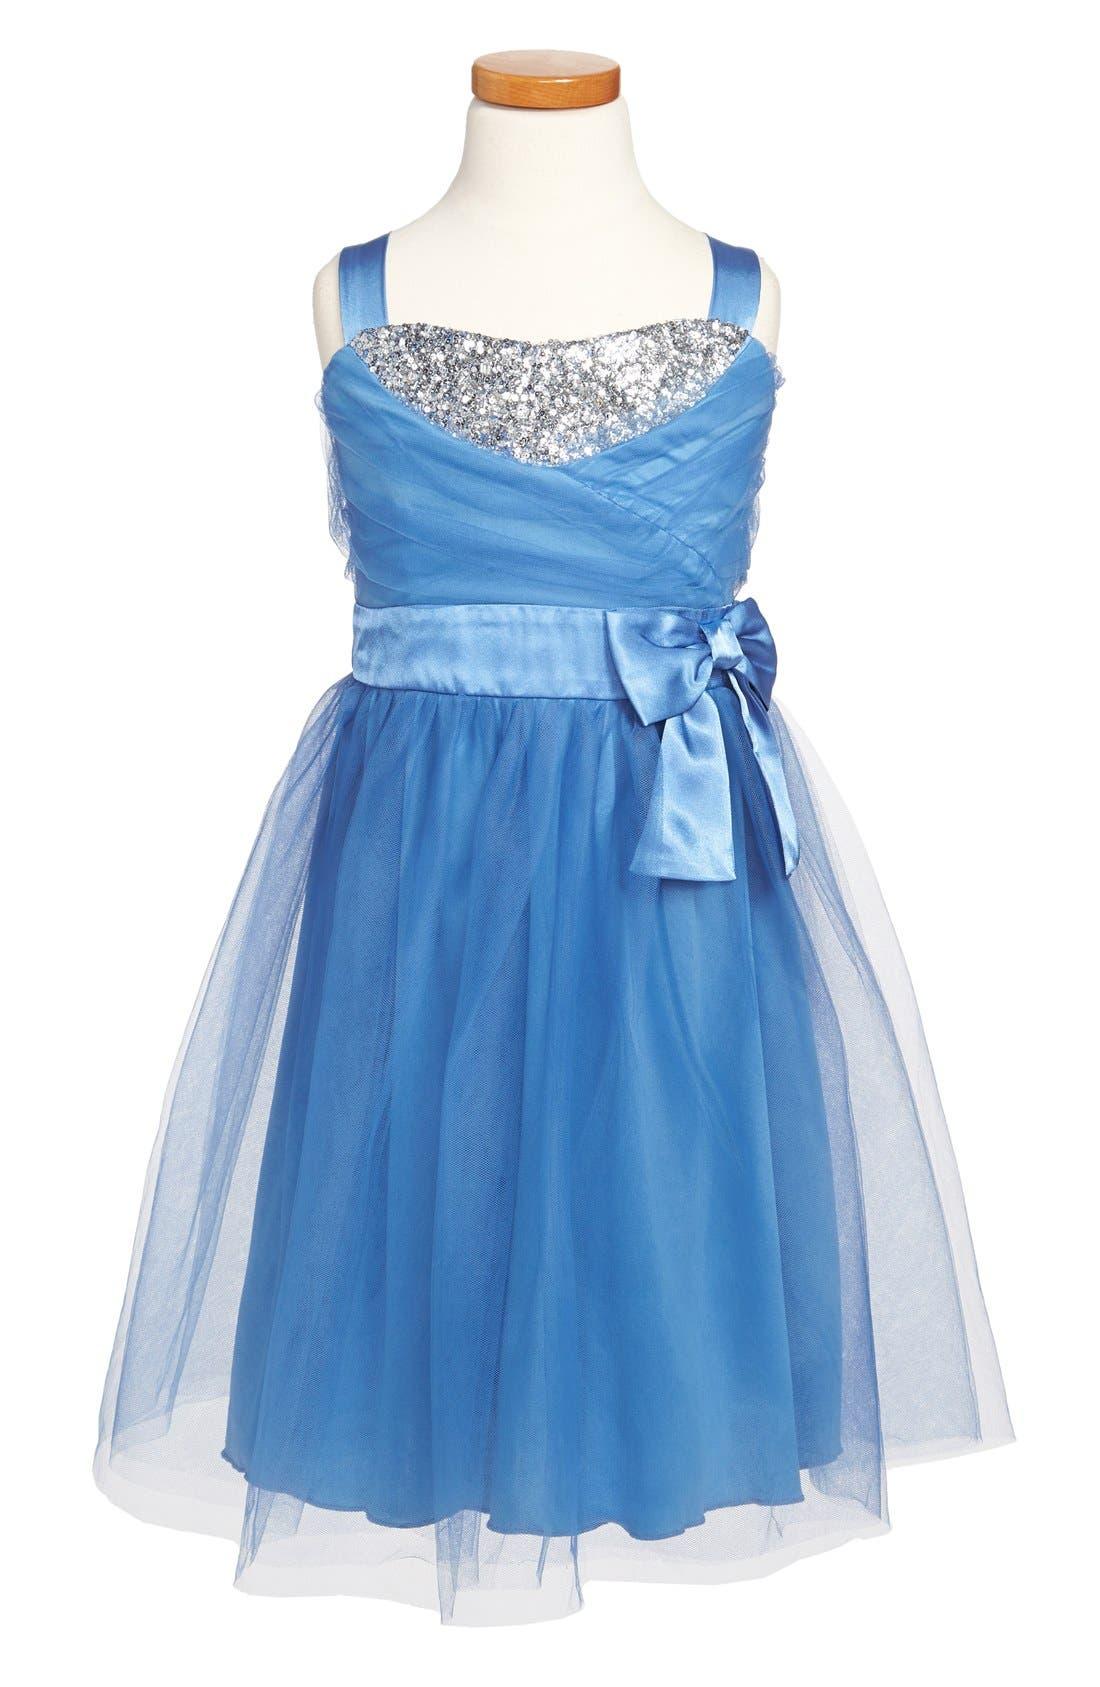 Alternate Image 1 Selected - Roxette Tulle Dress (Big Girls)